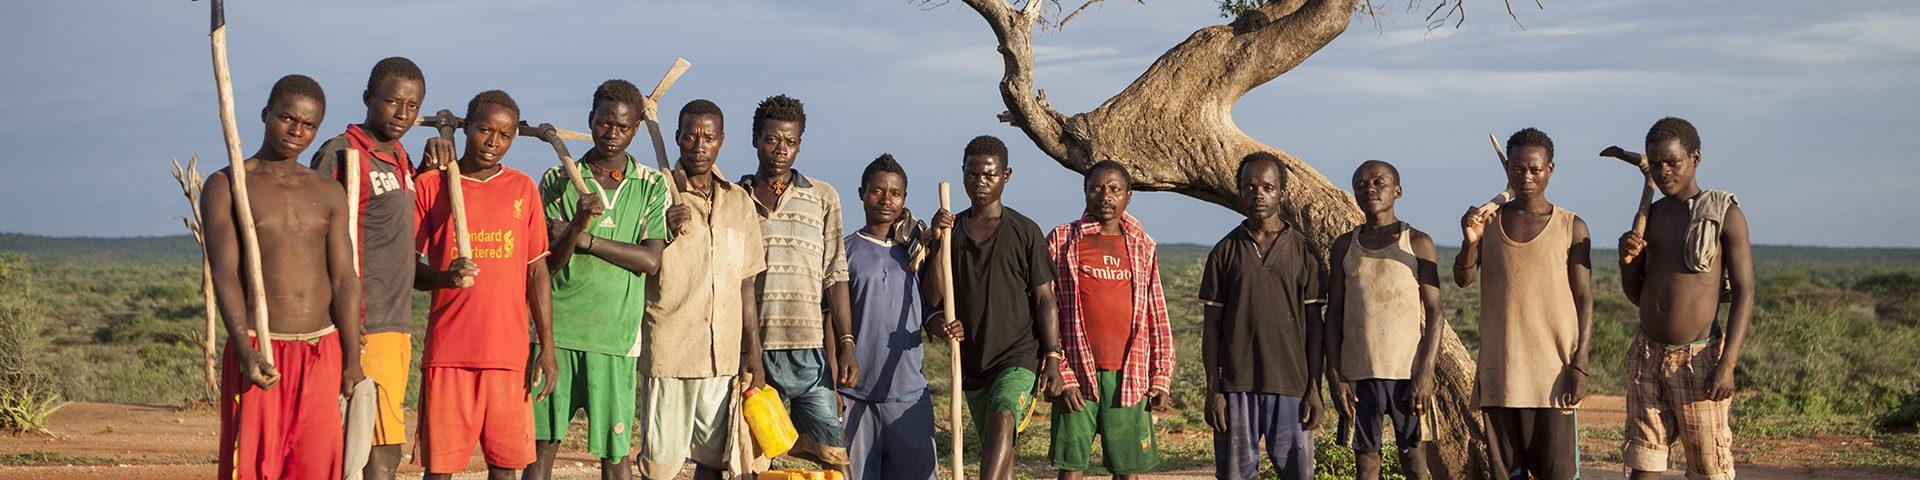 Dagboek Ethiopië 0269 large ©Mike Roelofs